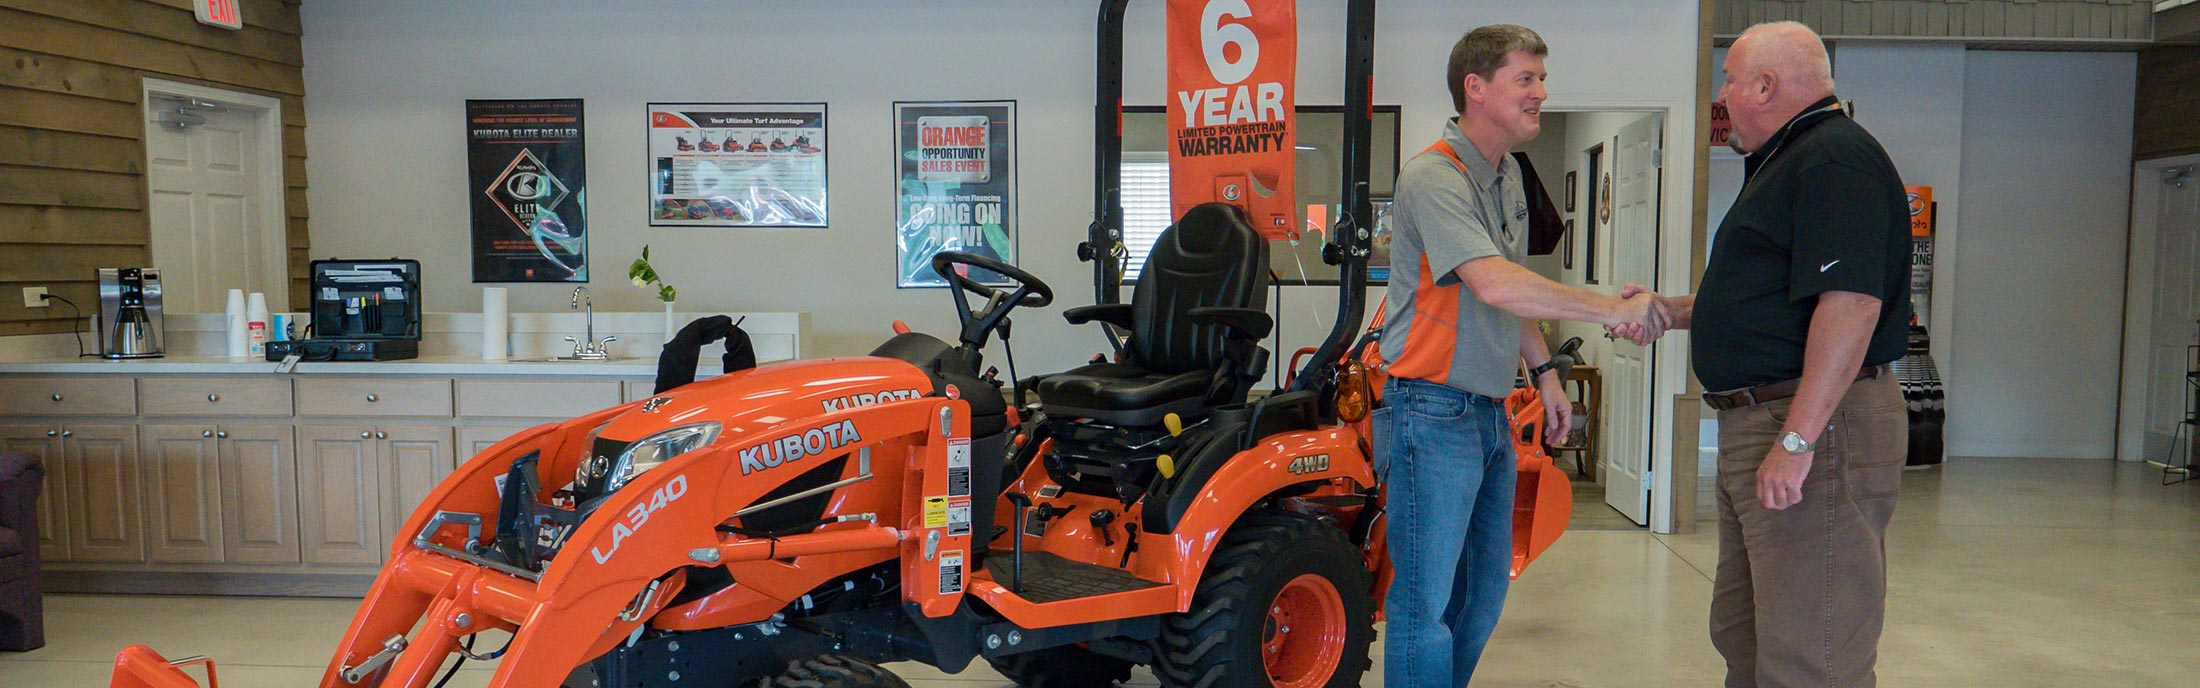 Kubota Dealer, Nelson Tractor Salesman and Customer shaking hands